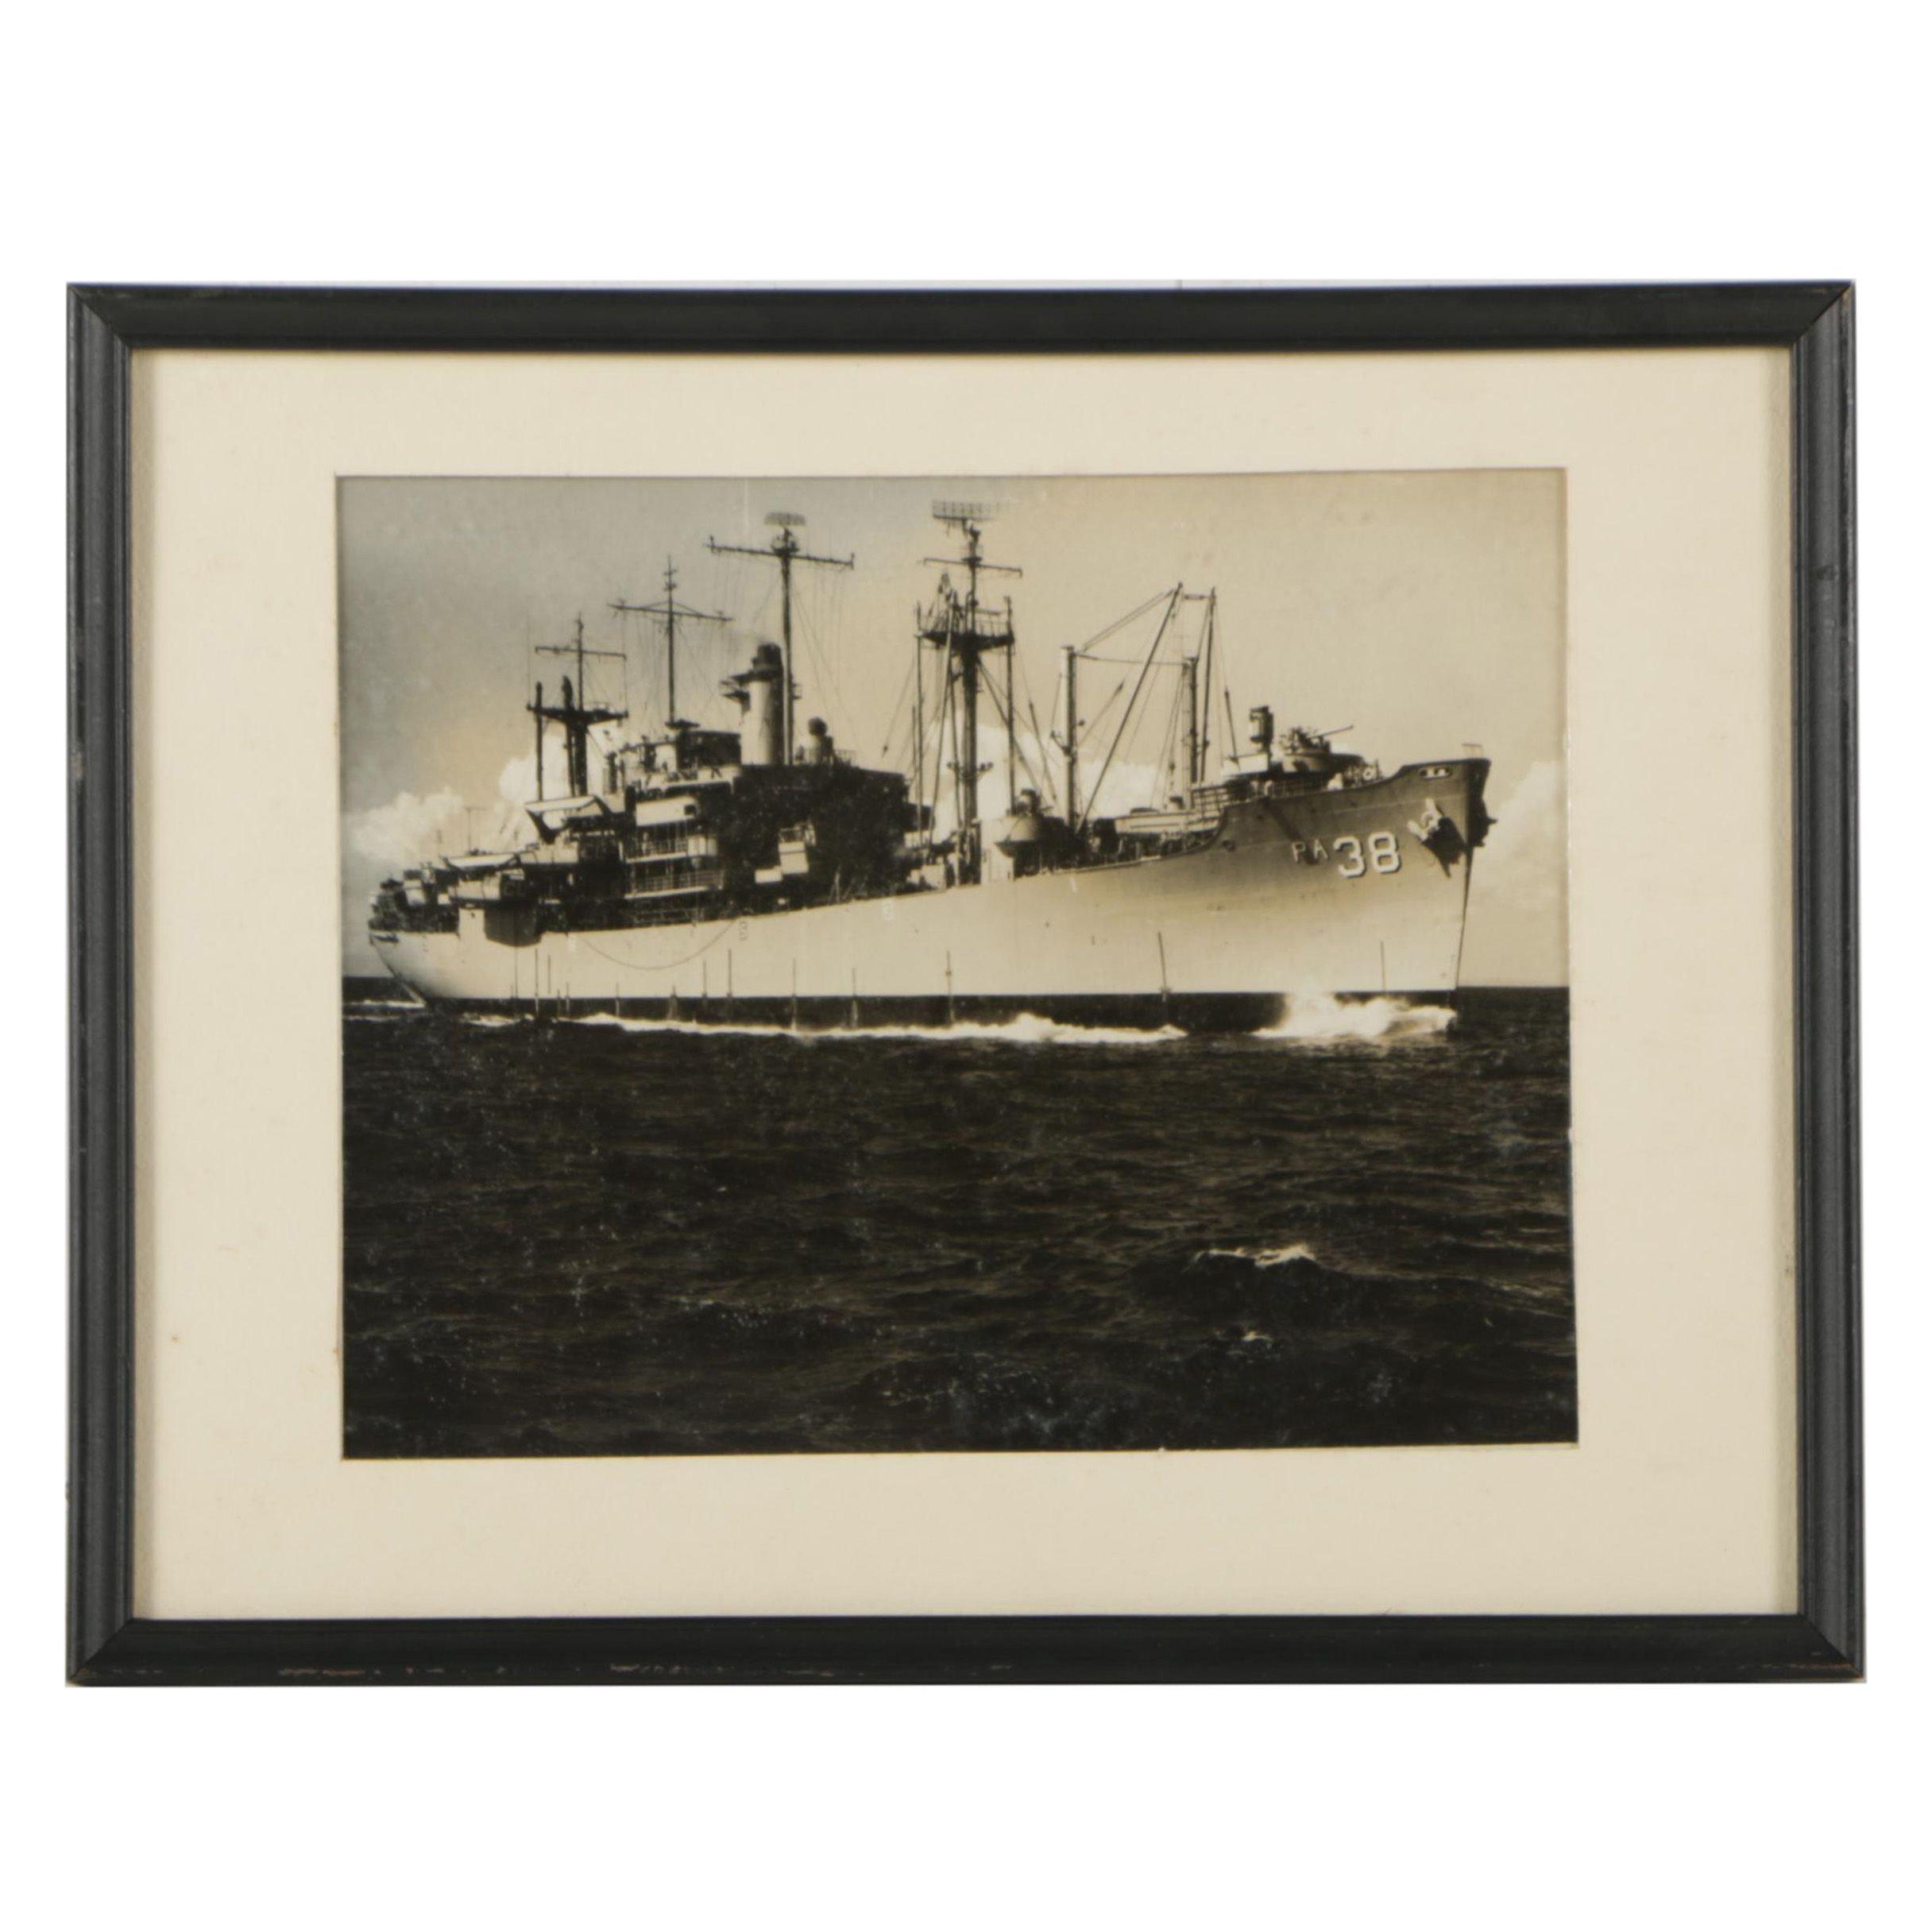 Vintage Black & White Photograph of USS Chilton (APA-38)